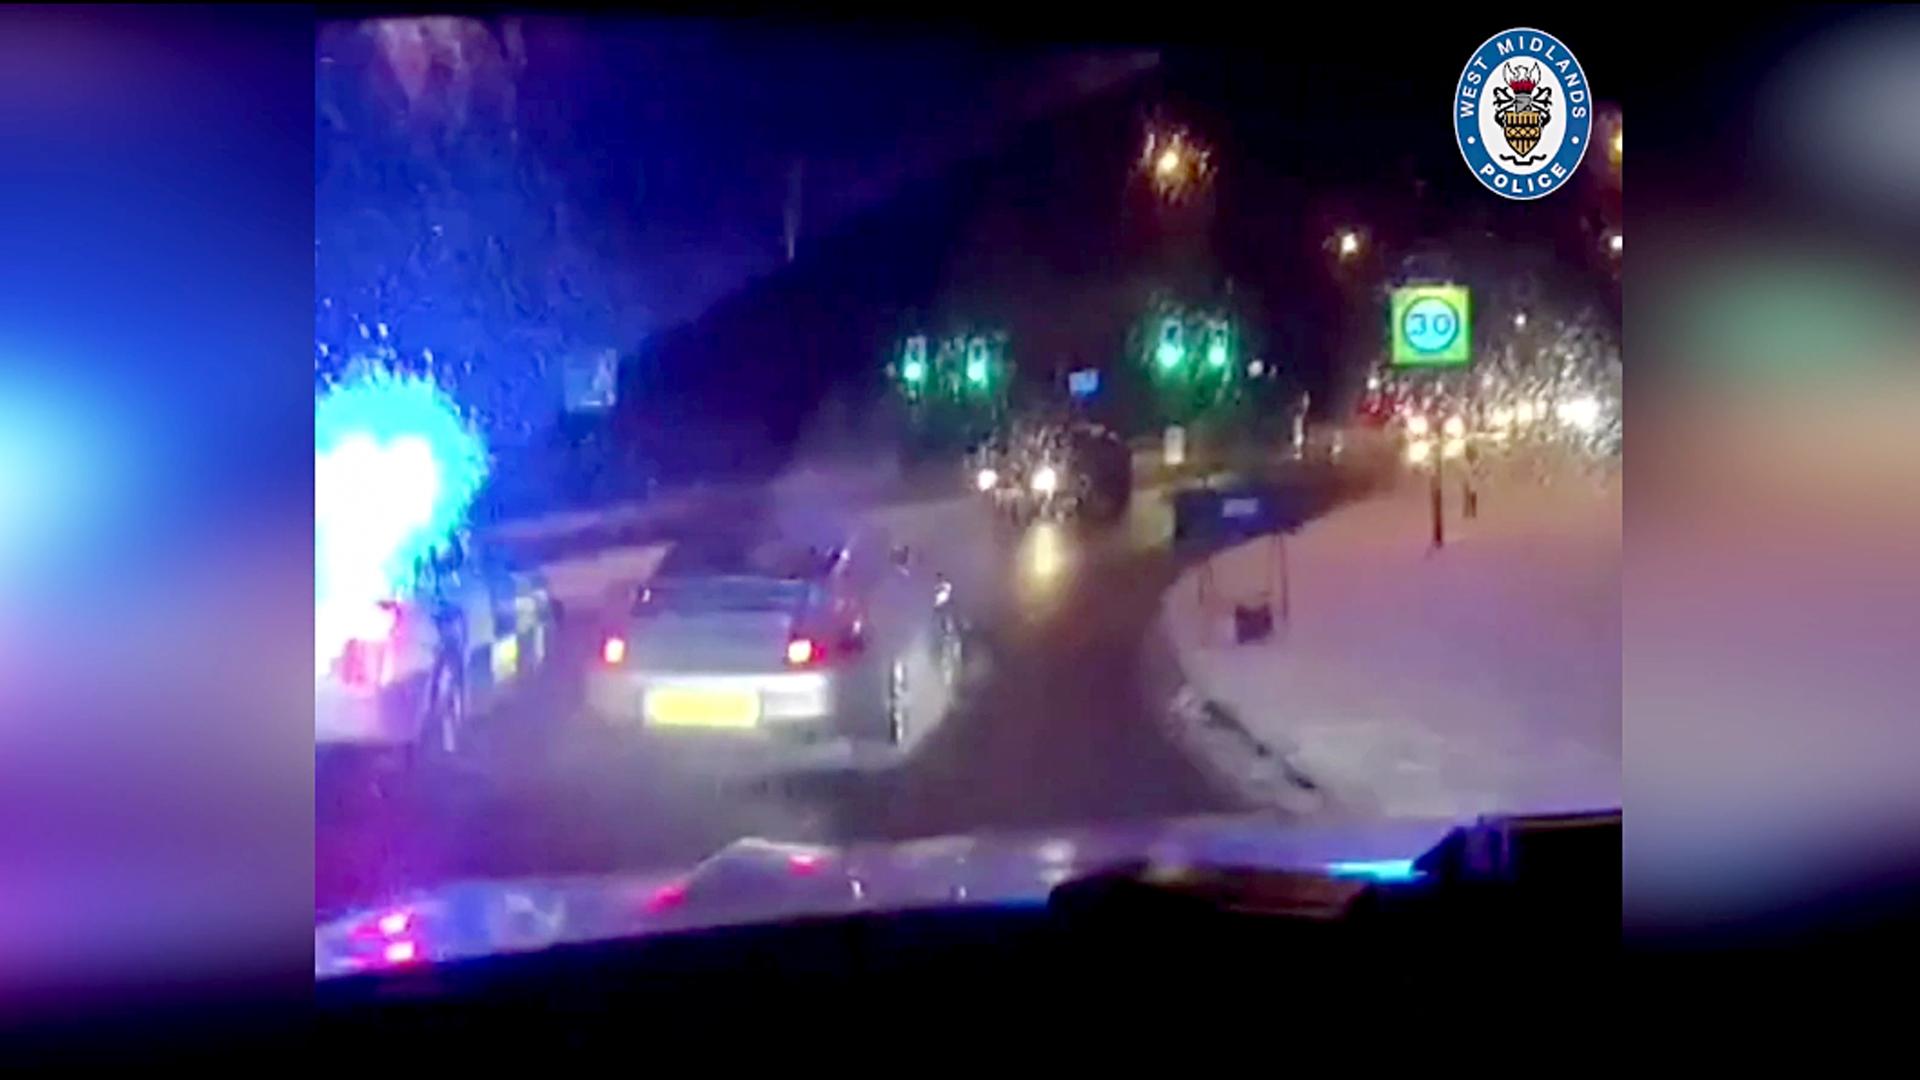 VIDEO: Porsche Carrer-argh: Cops Taser Car Thief After High Speed Chase